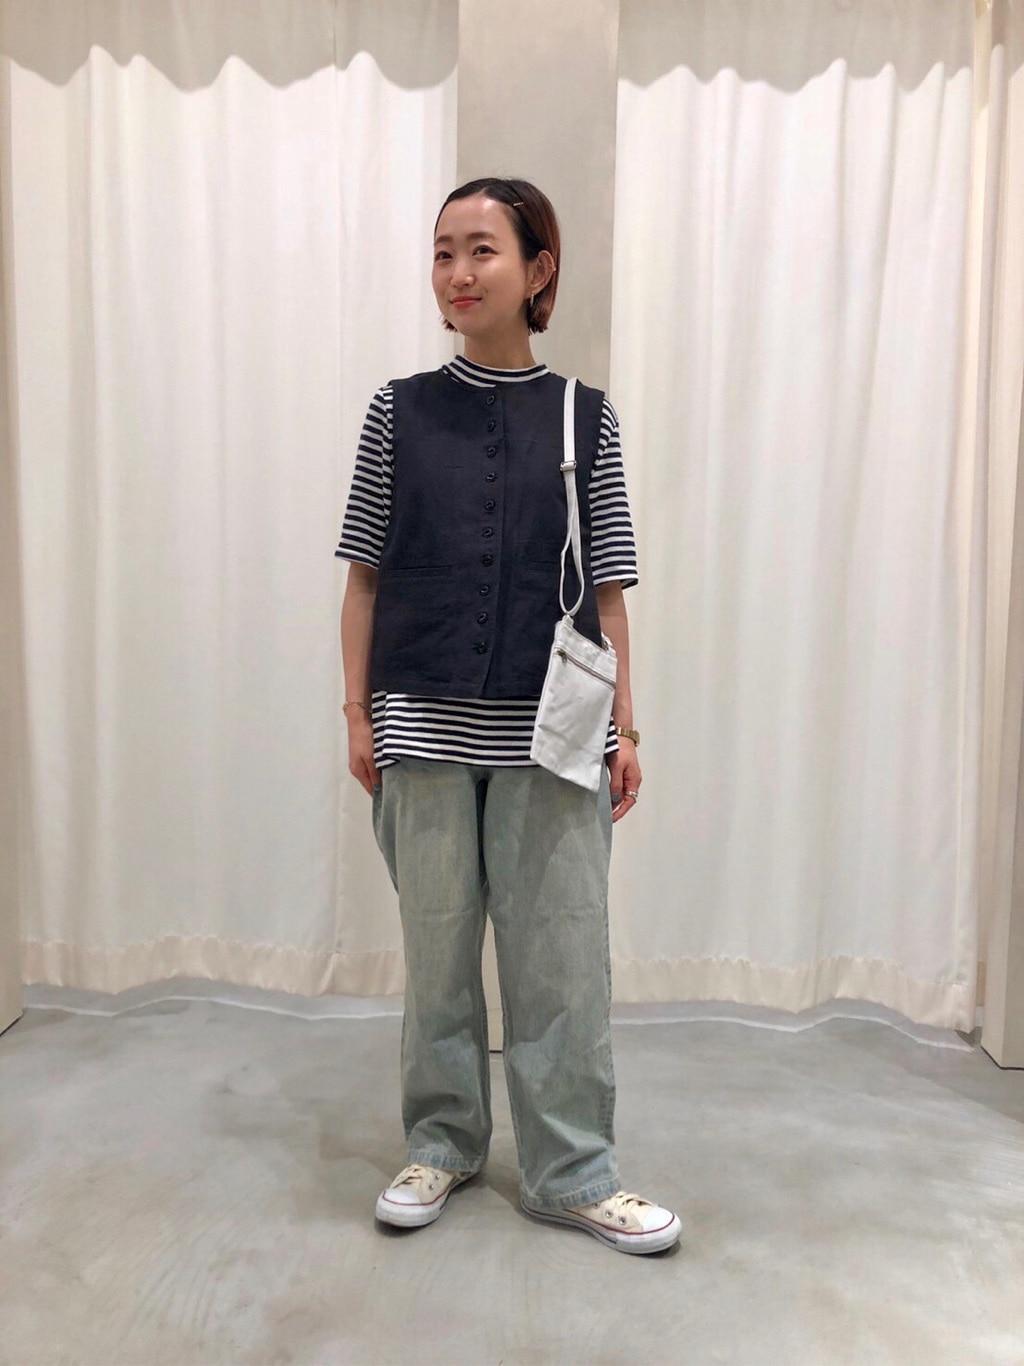 - CHILD WOMAN CHILD WOMAN , PAR ICI 東京スカイツリータウン・ソラマチ 身長:150cm 2020.08.06